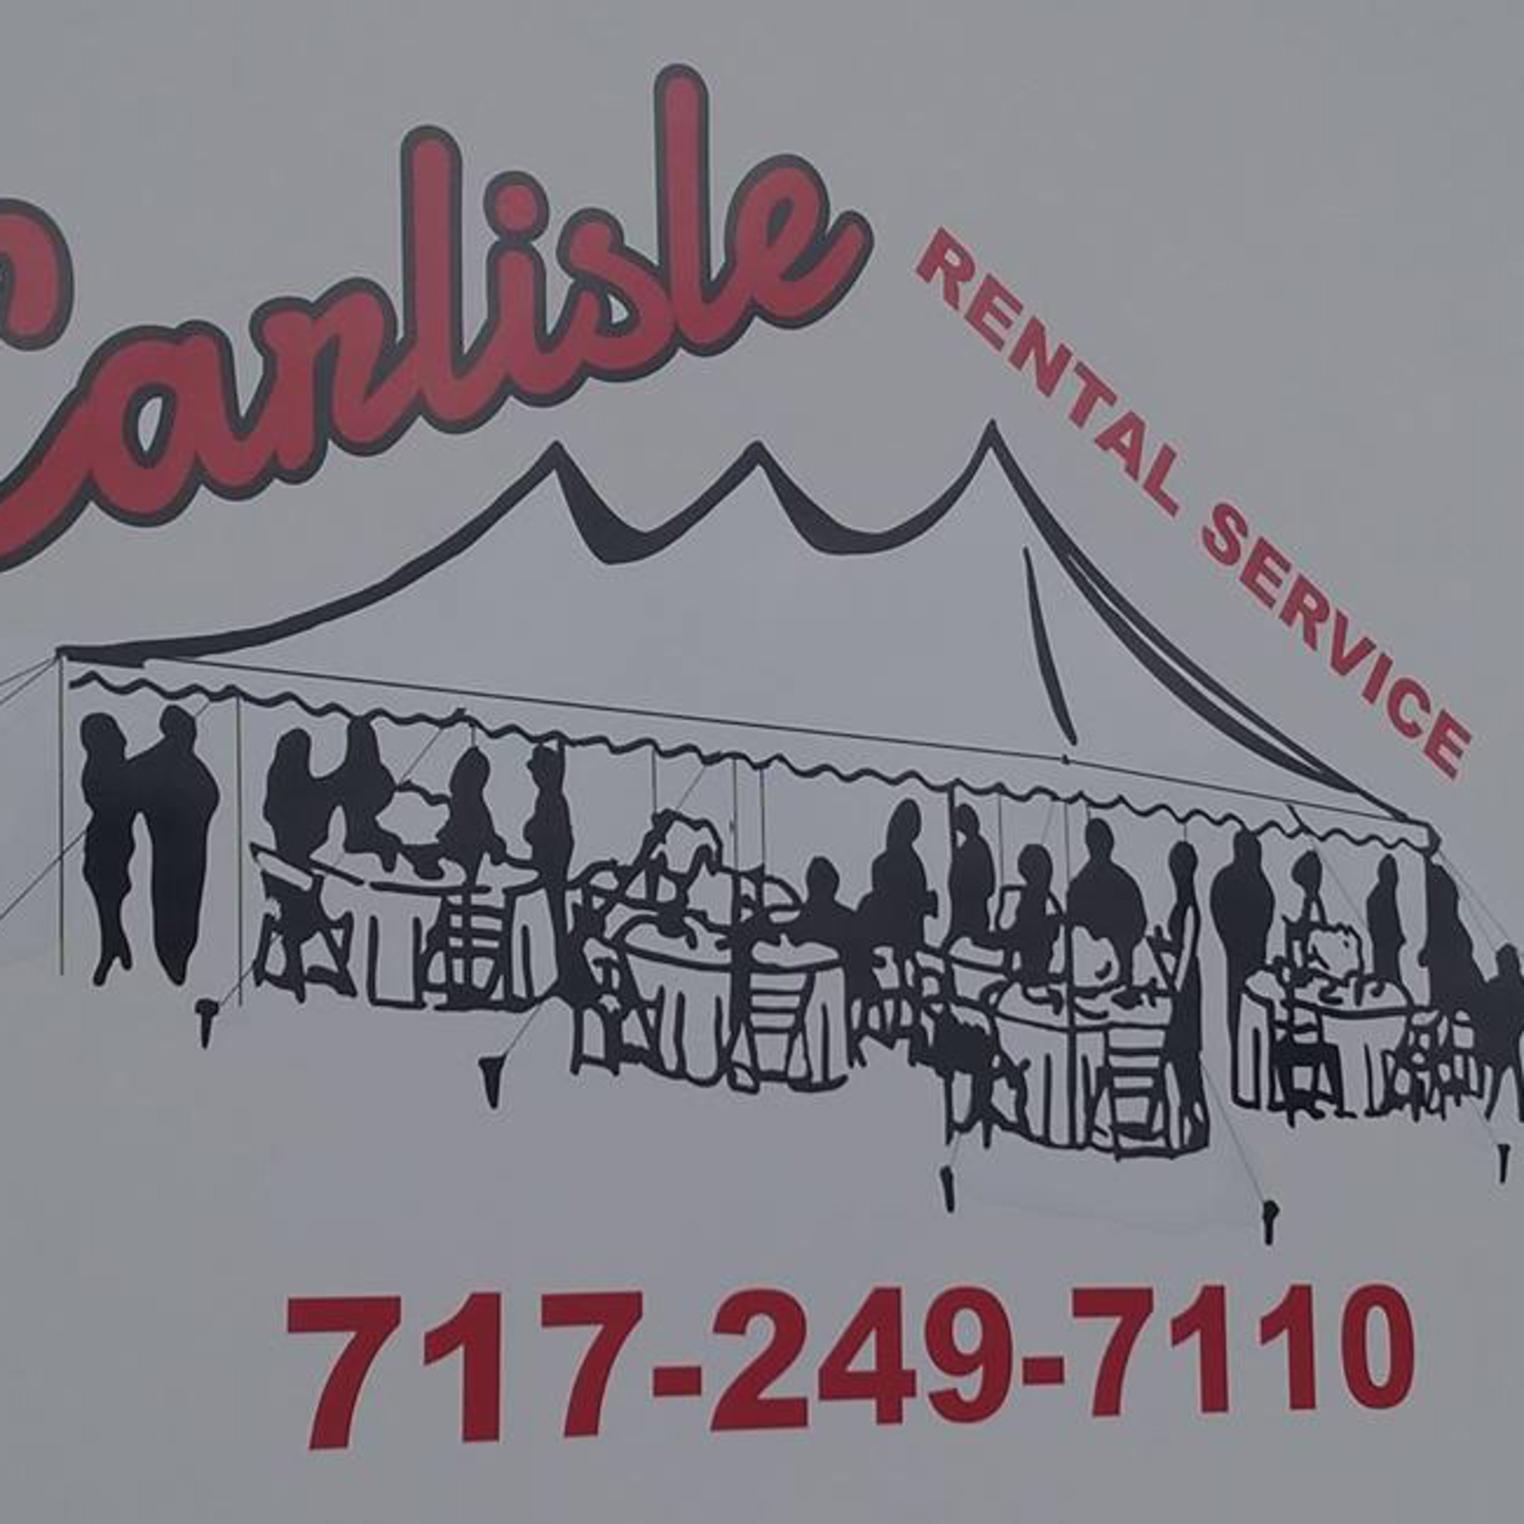 Carlisle Rental Service